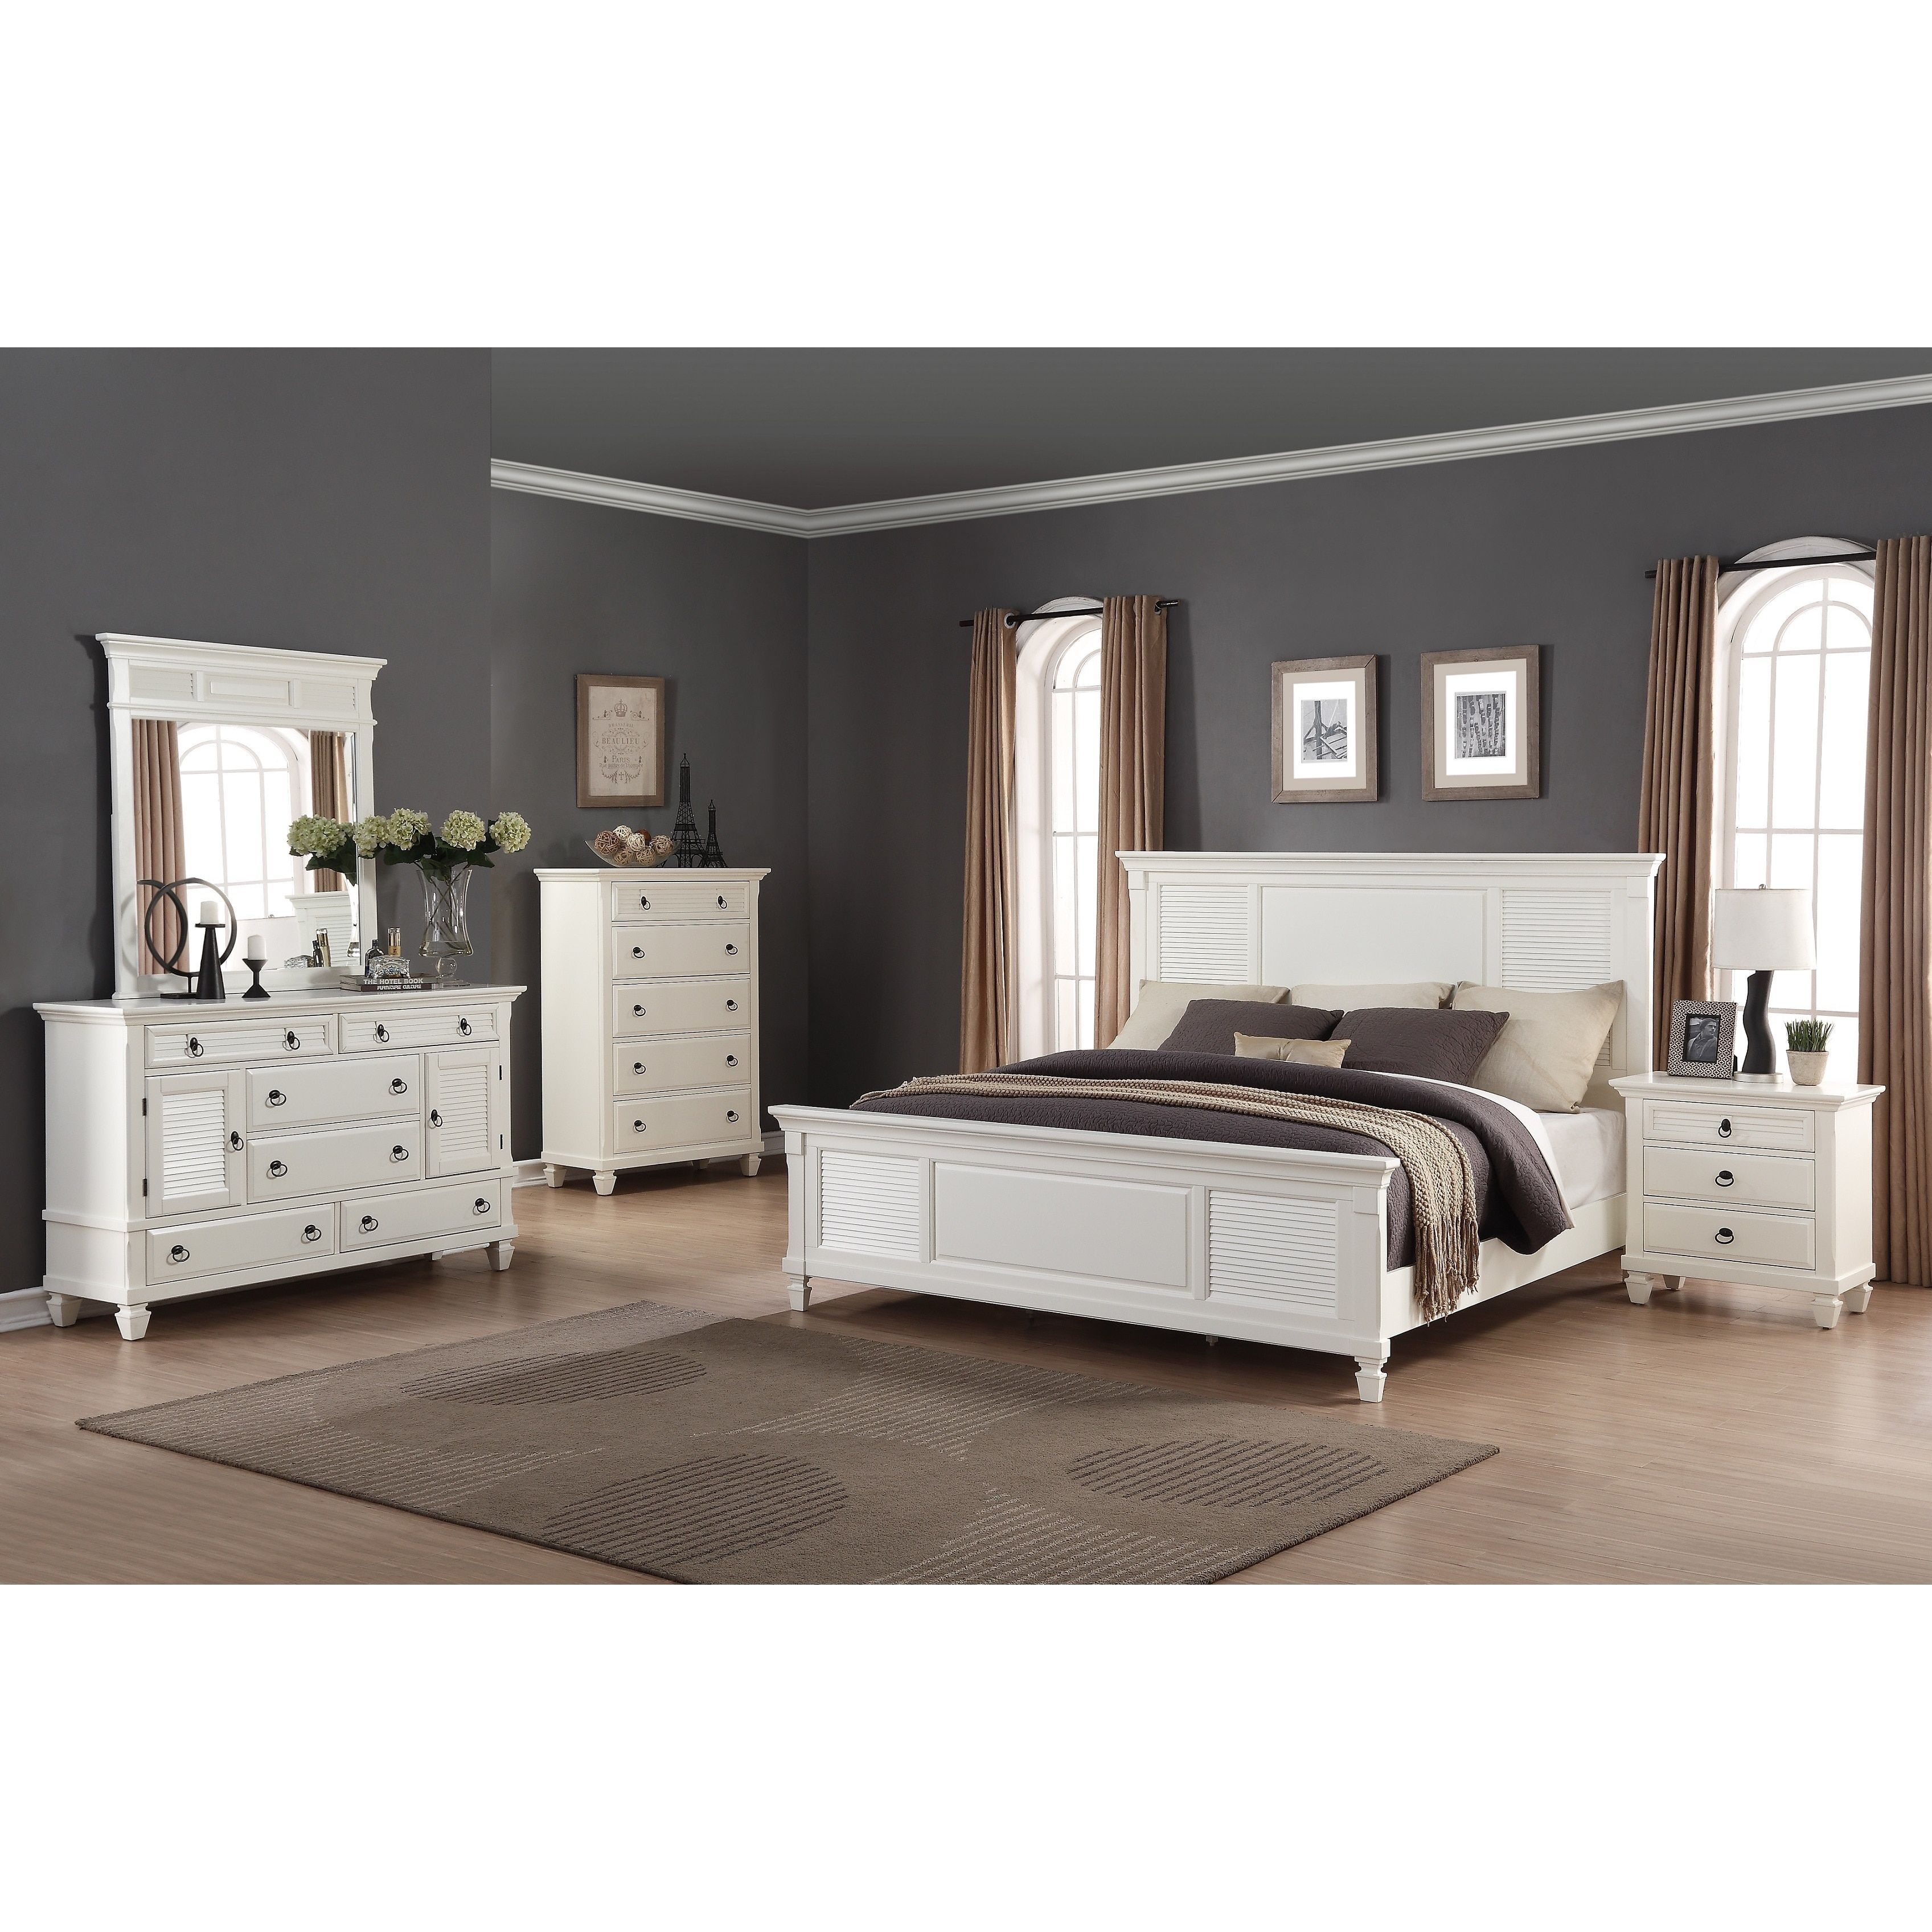 king black size recyclenebraska master complete with org suite headboard nice queen furniture sets storage set bedroom